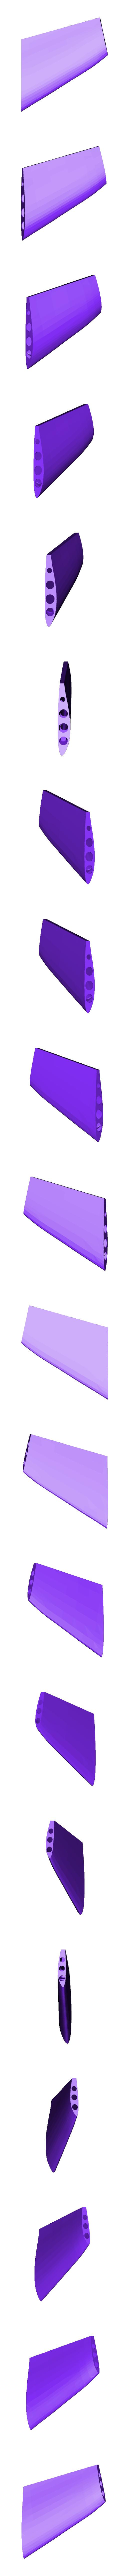 Wing L4.obj Download free OBJ file Small Static Horten 229 • 3D printable object, francoispeyper